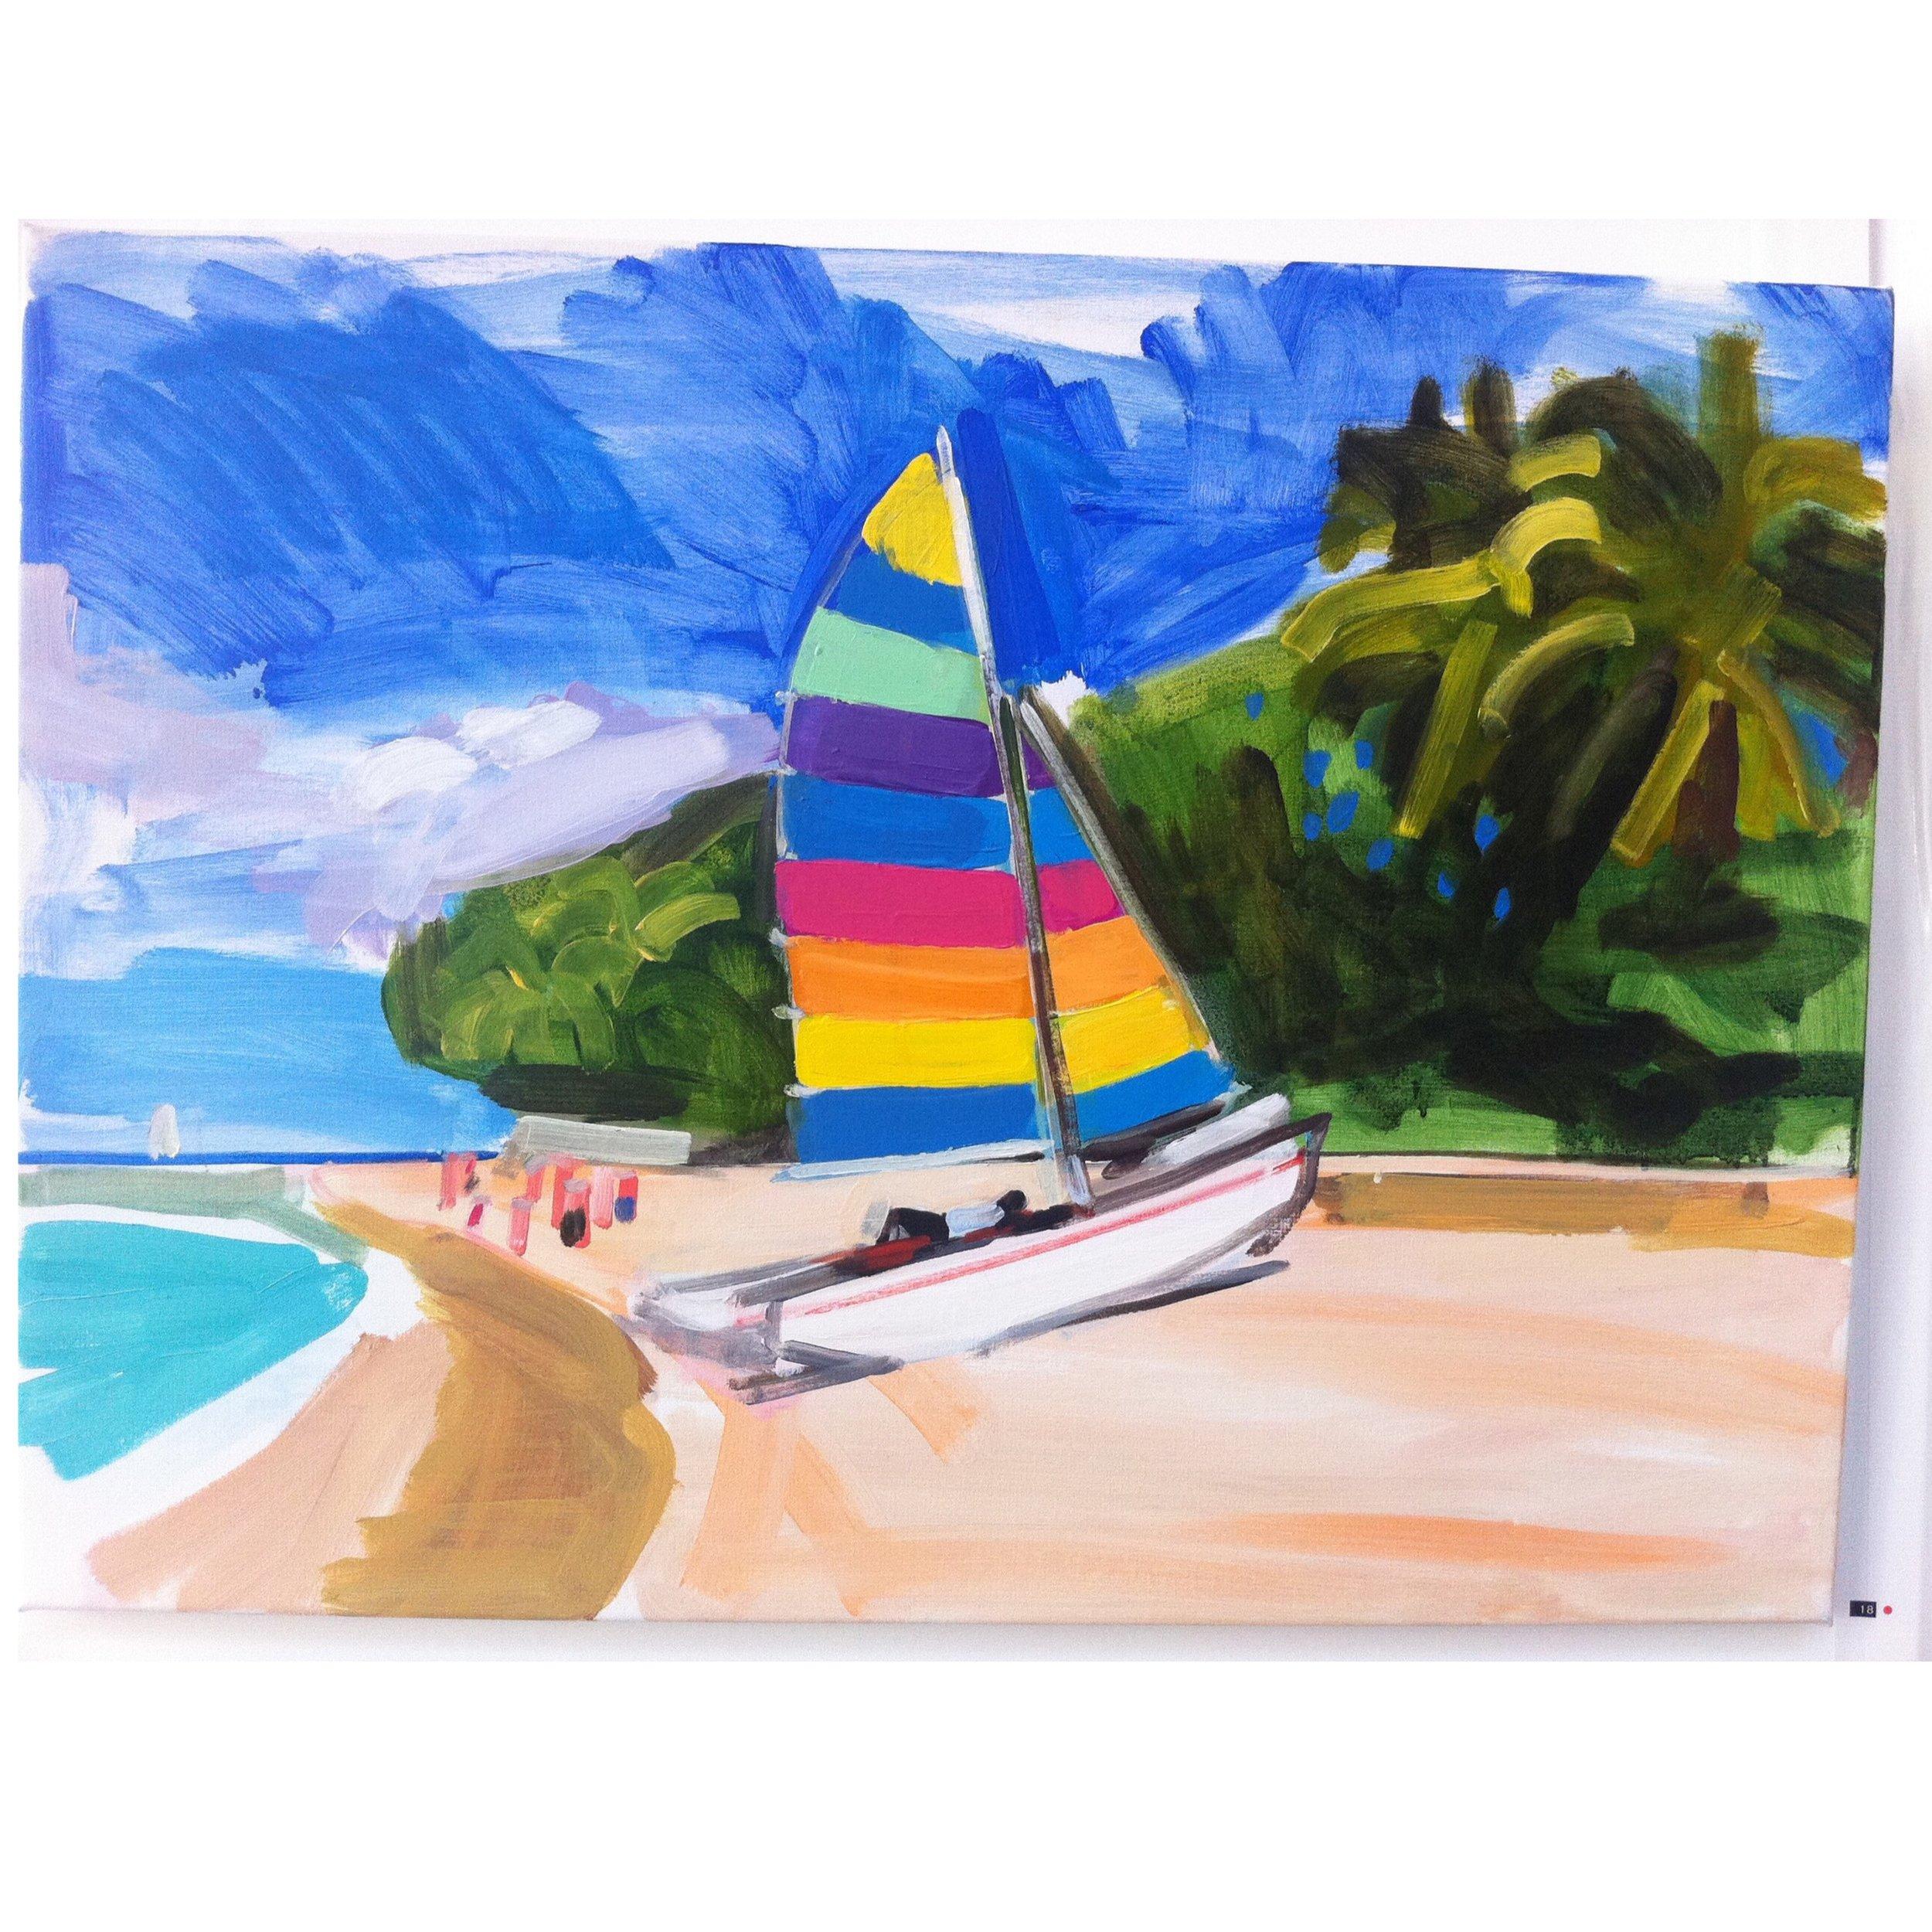 Barbados 90 x 70cm oil on canvas 2012